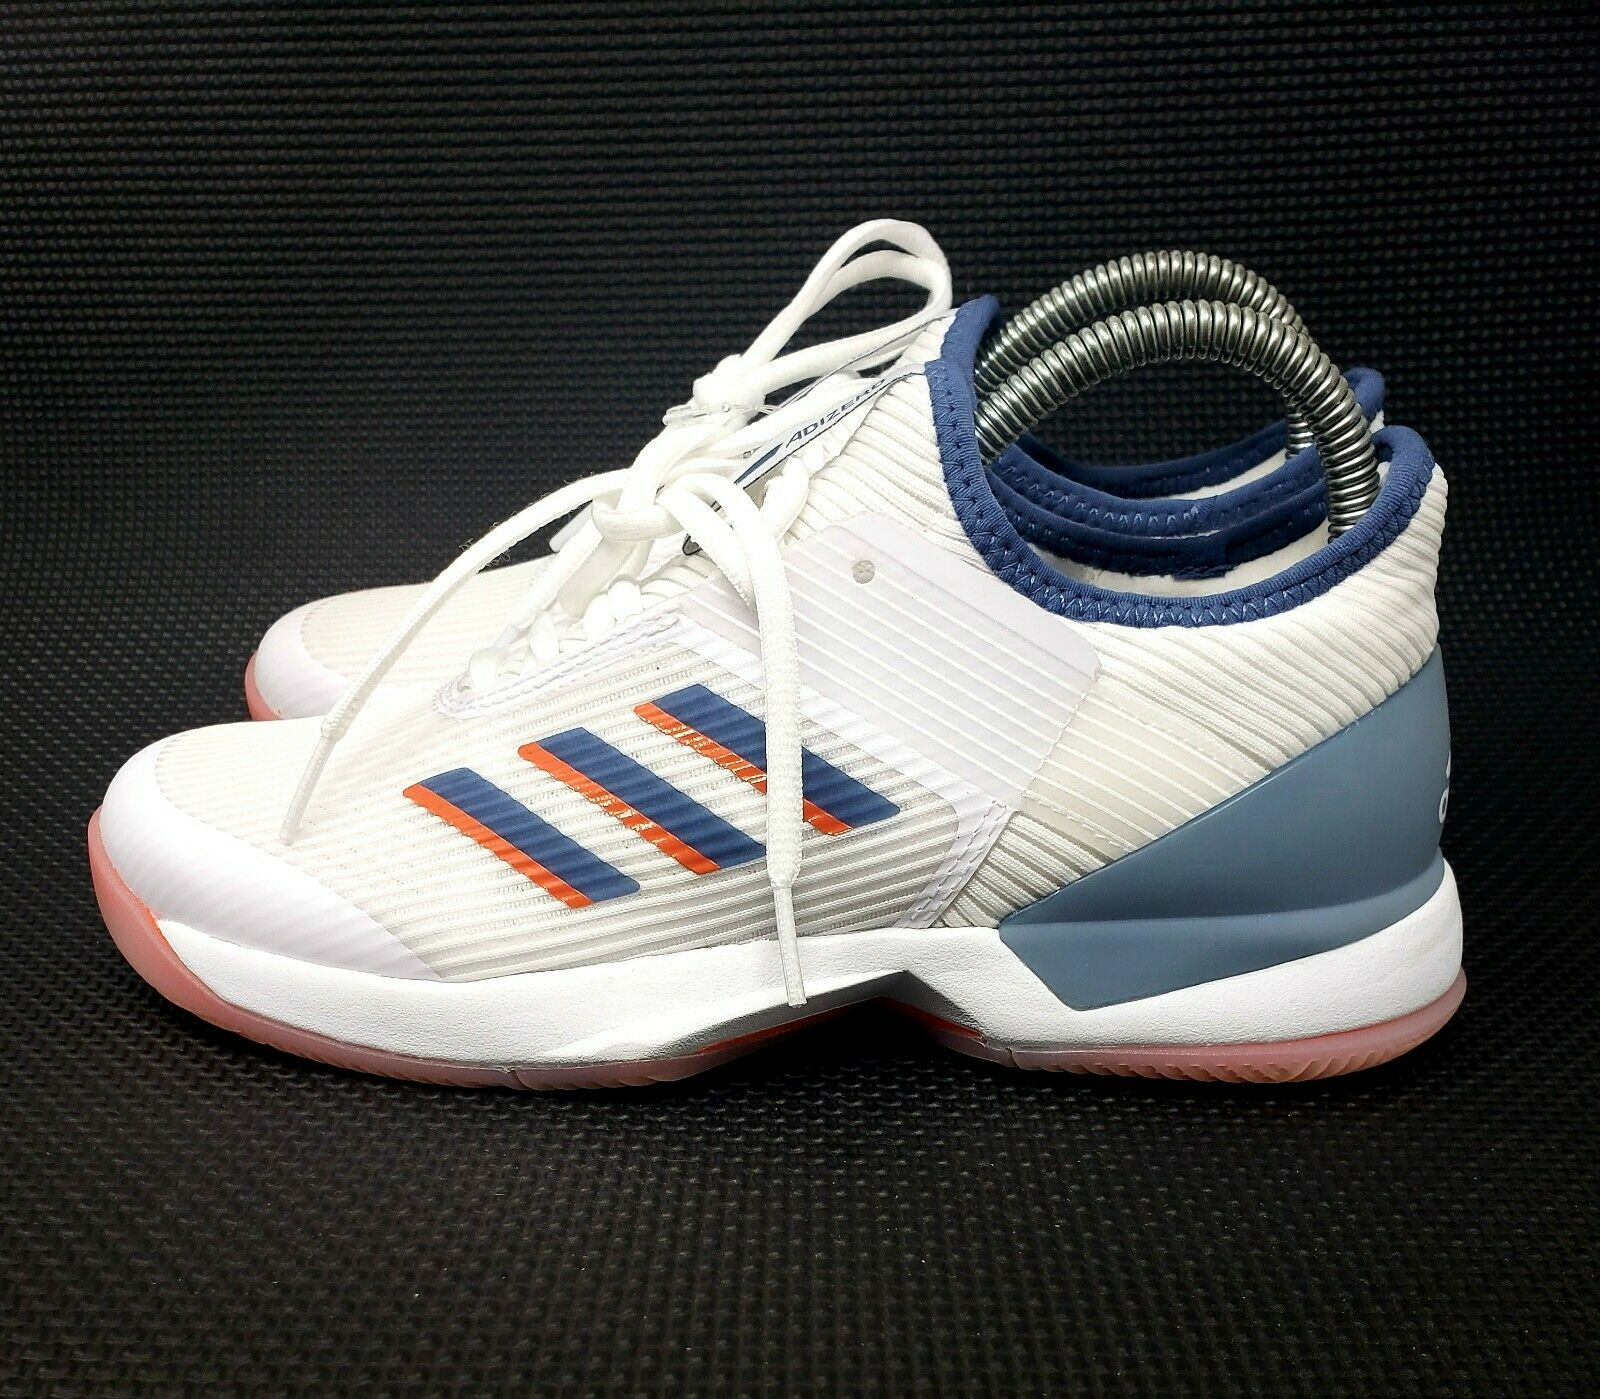 parrilla Barón Novio  adidas - Women`s Adizero Ubersonic 3 Jade Tennis Shoes Tactile Green and  Collegi 6 for sale online | eBay